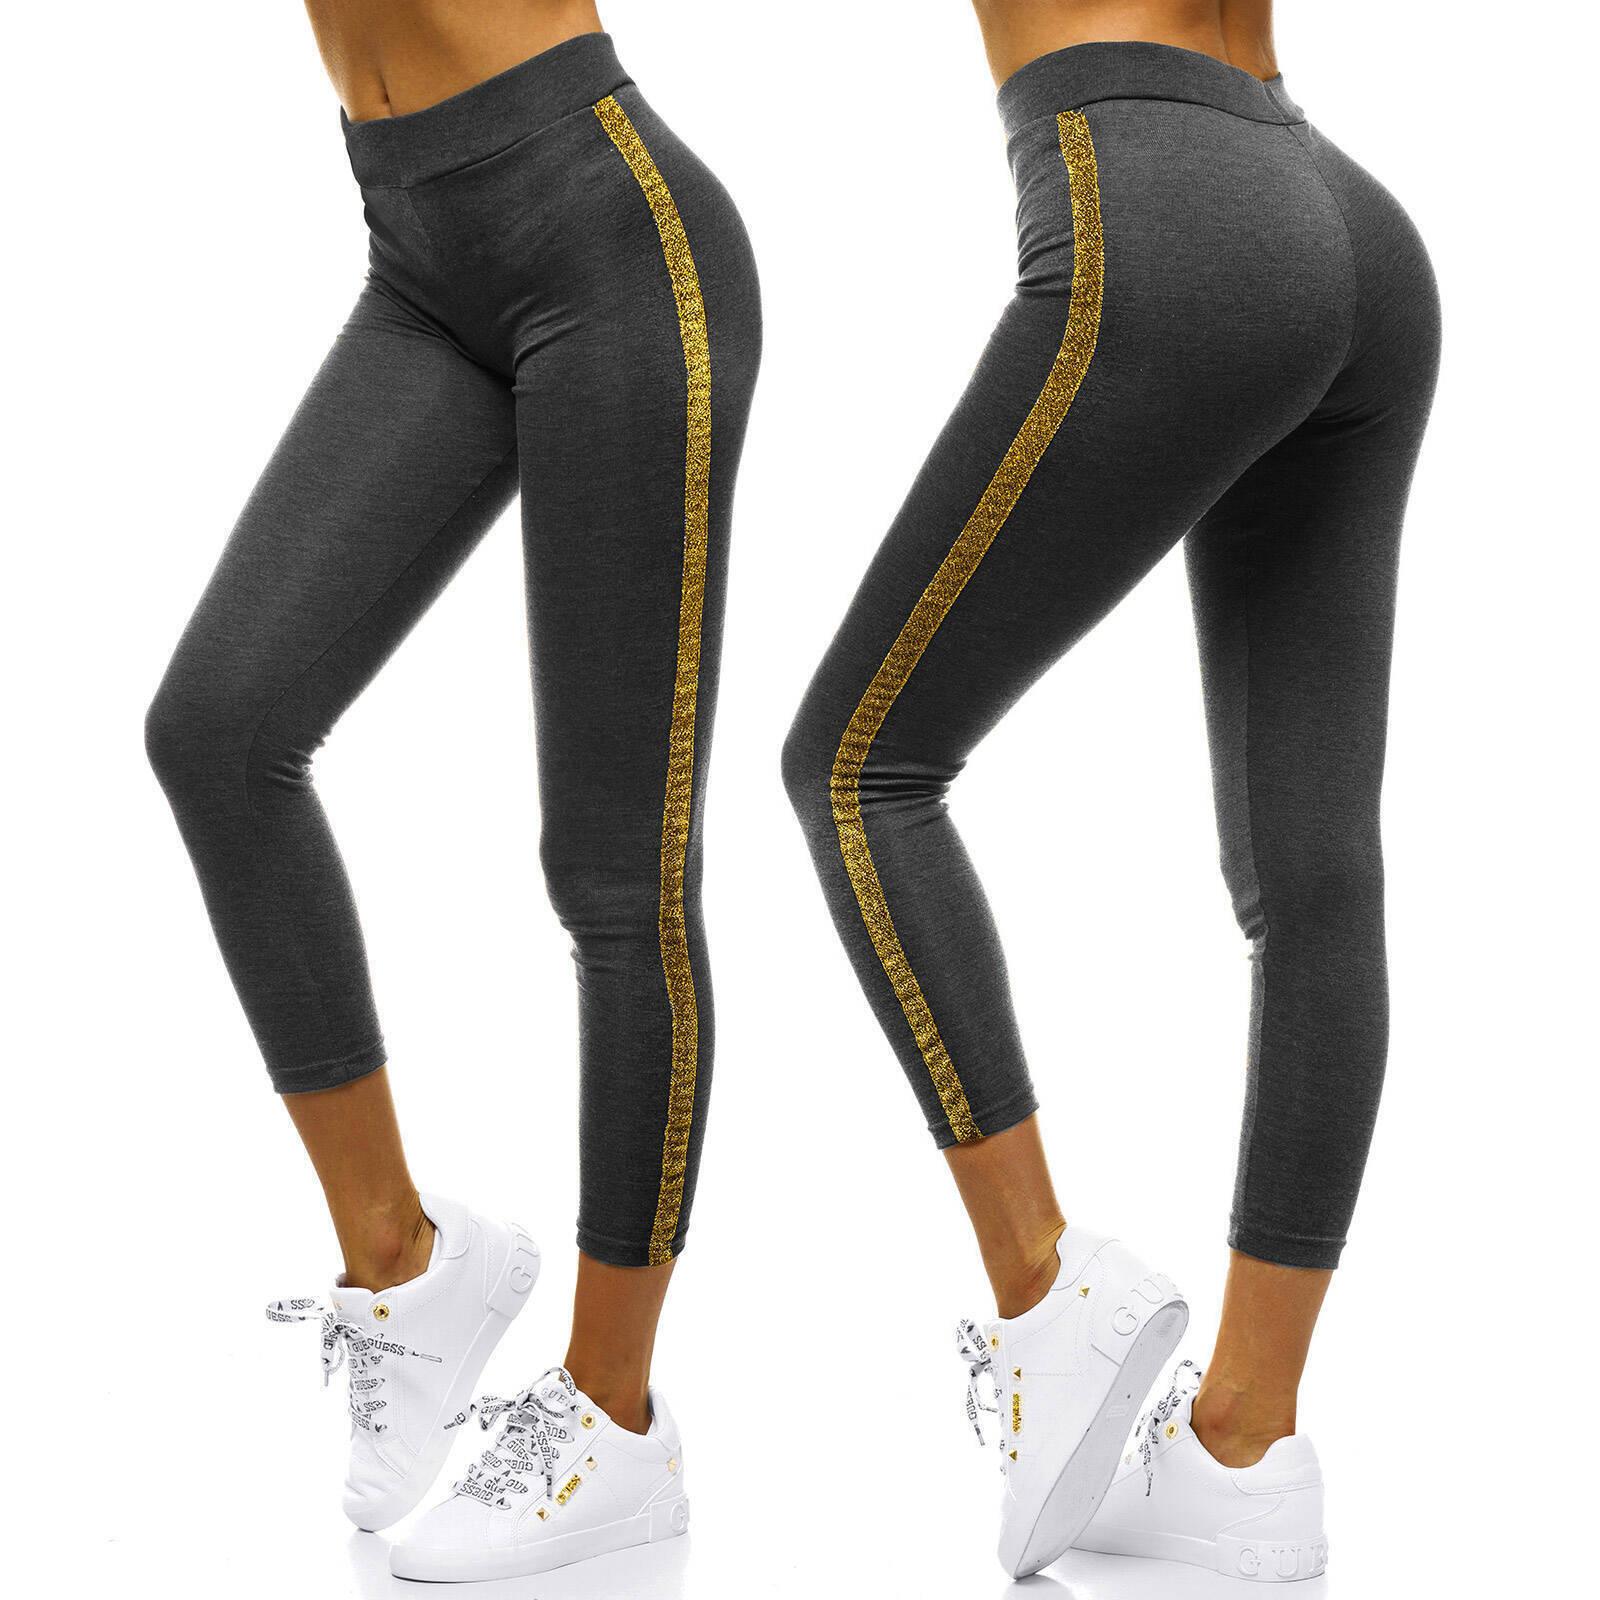 Leggings-Sport-Yoga-Fitness-Leggins-Jogginghose-Trainingshose-Hose-Damen-OZONEE miniatura 64